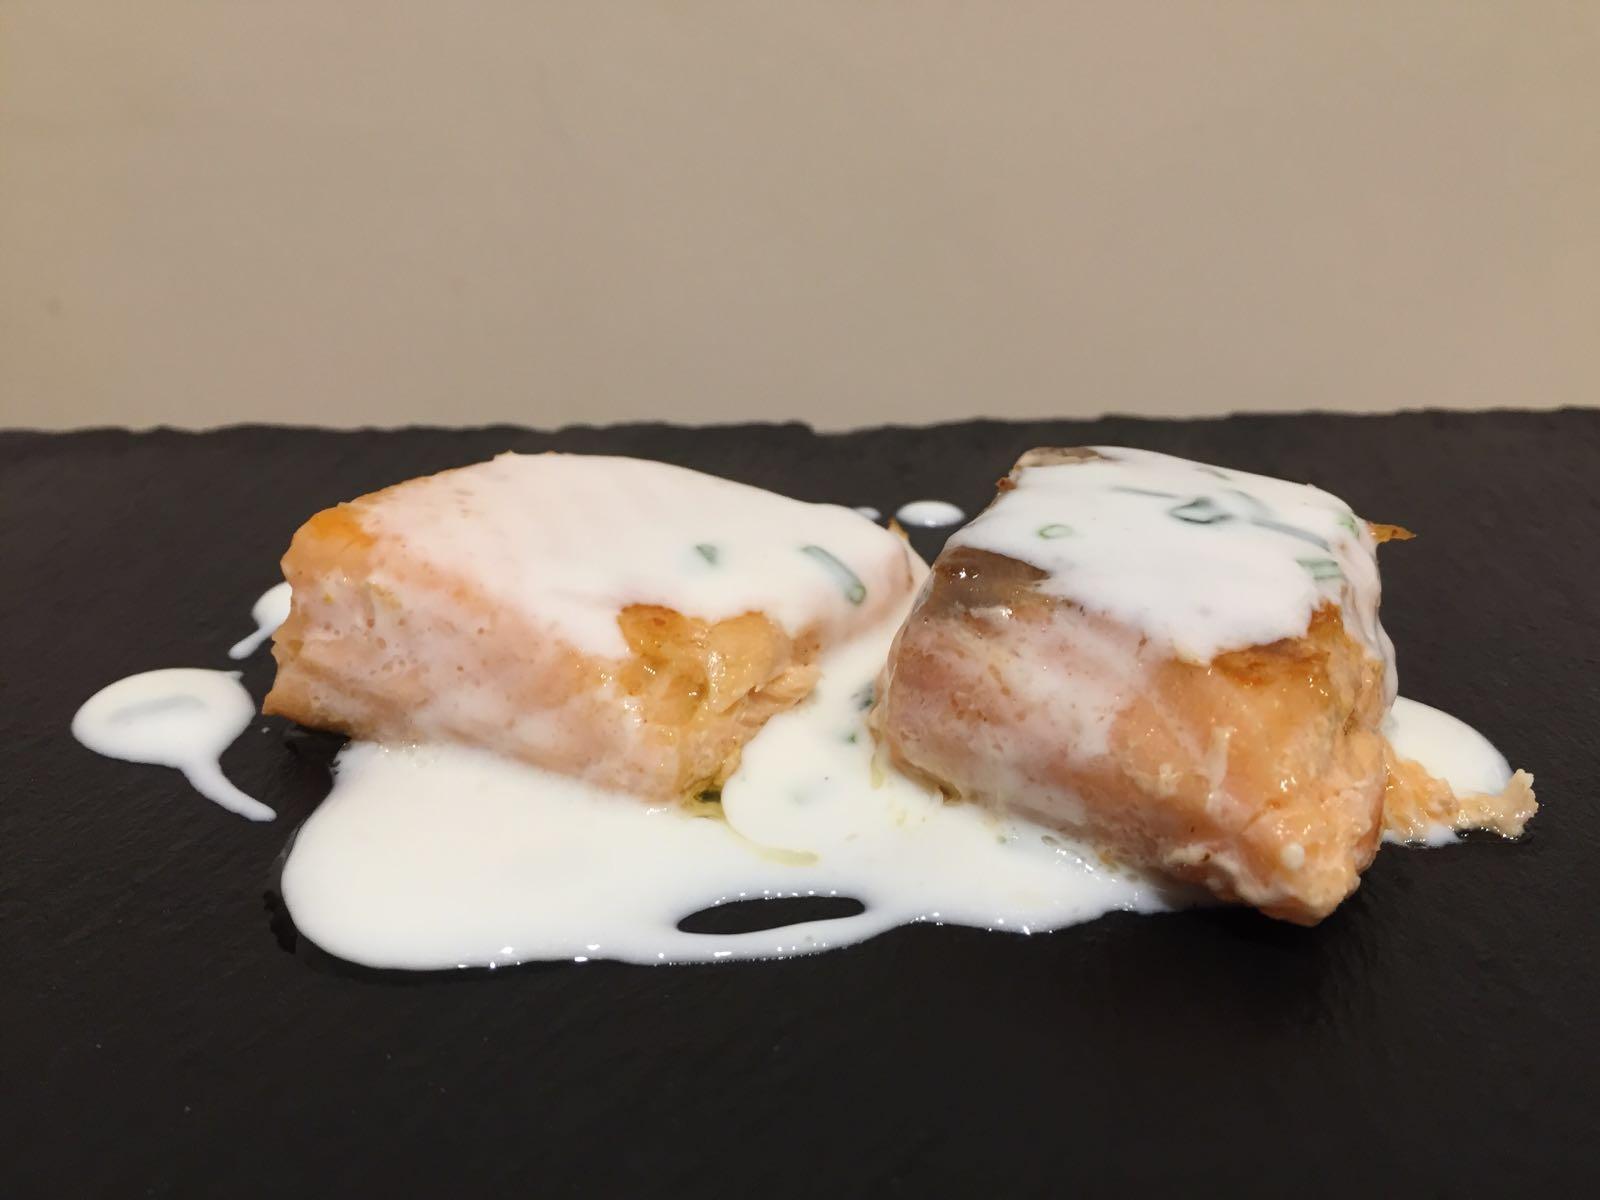 Salmone con salsa yogurt ed erba cipollina